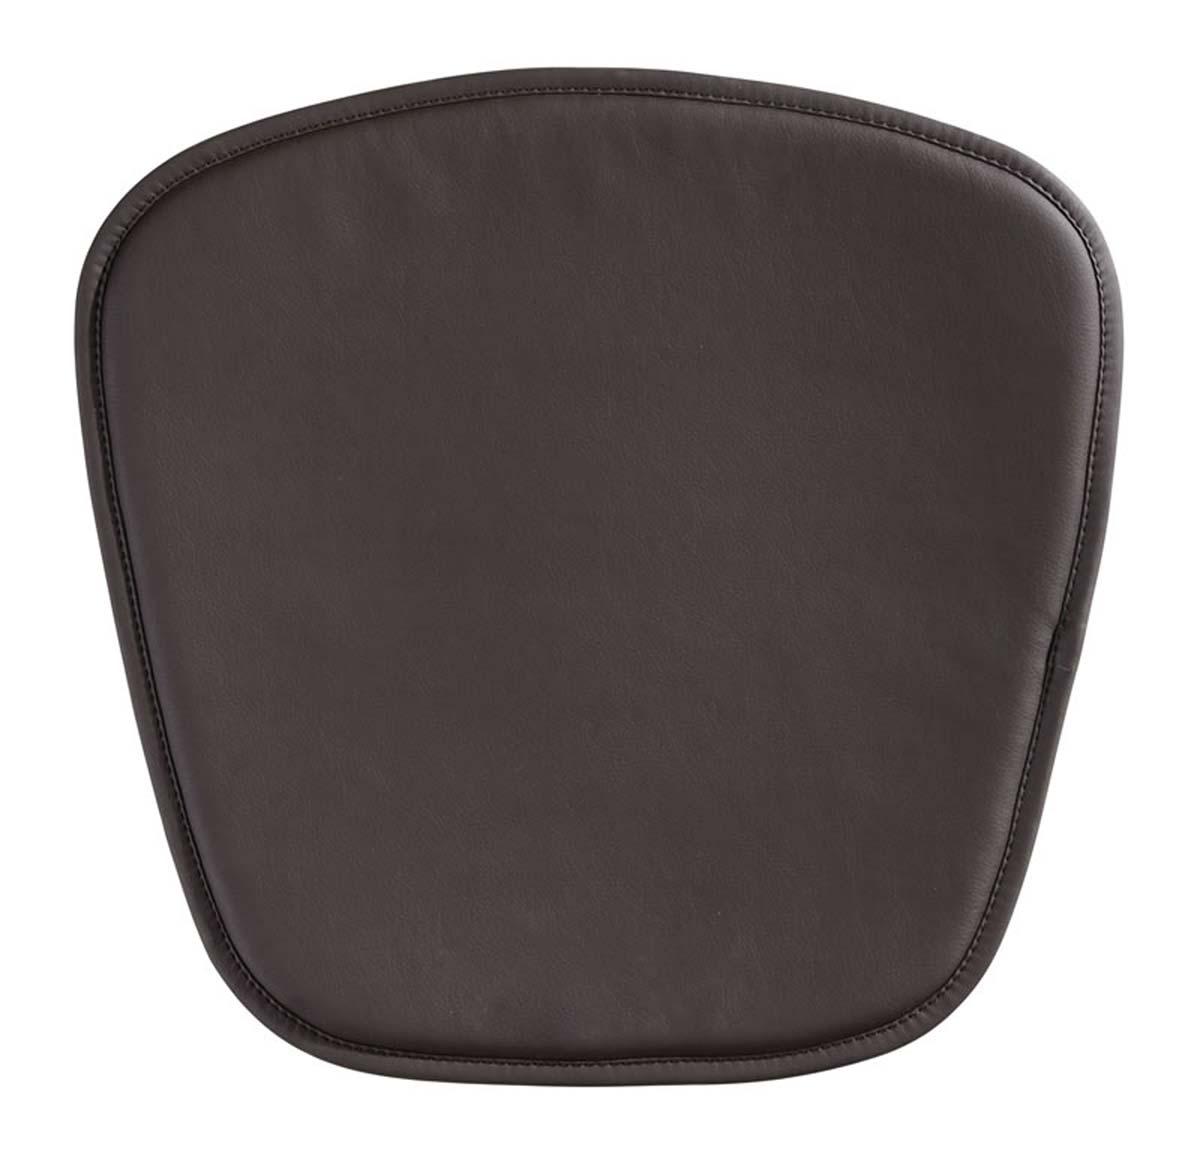 Zuo Modern Wire/Mesh Cushion - Espresso